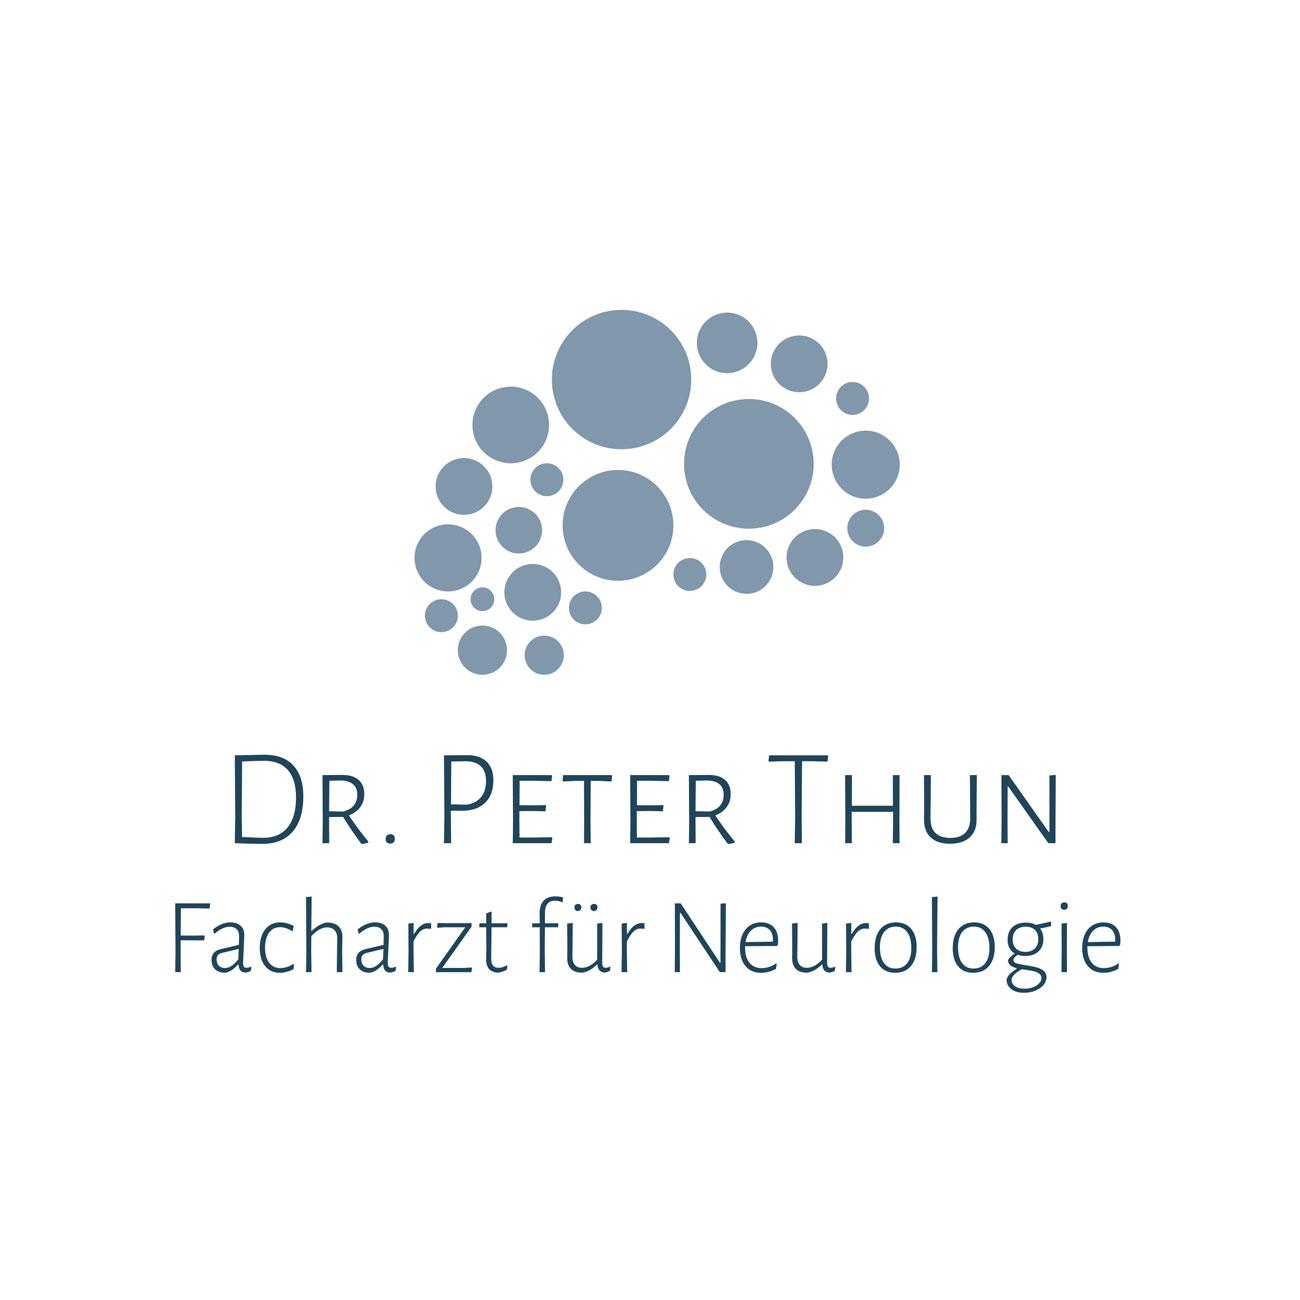 Bild zum Artikel Logo für den Neurologen Dr. Peter Thun